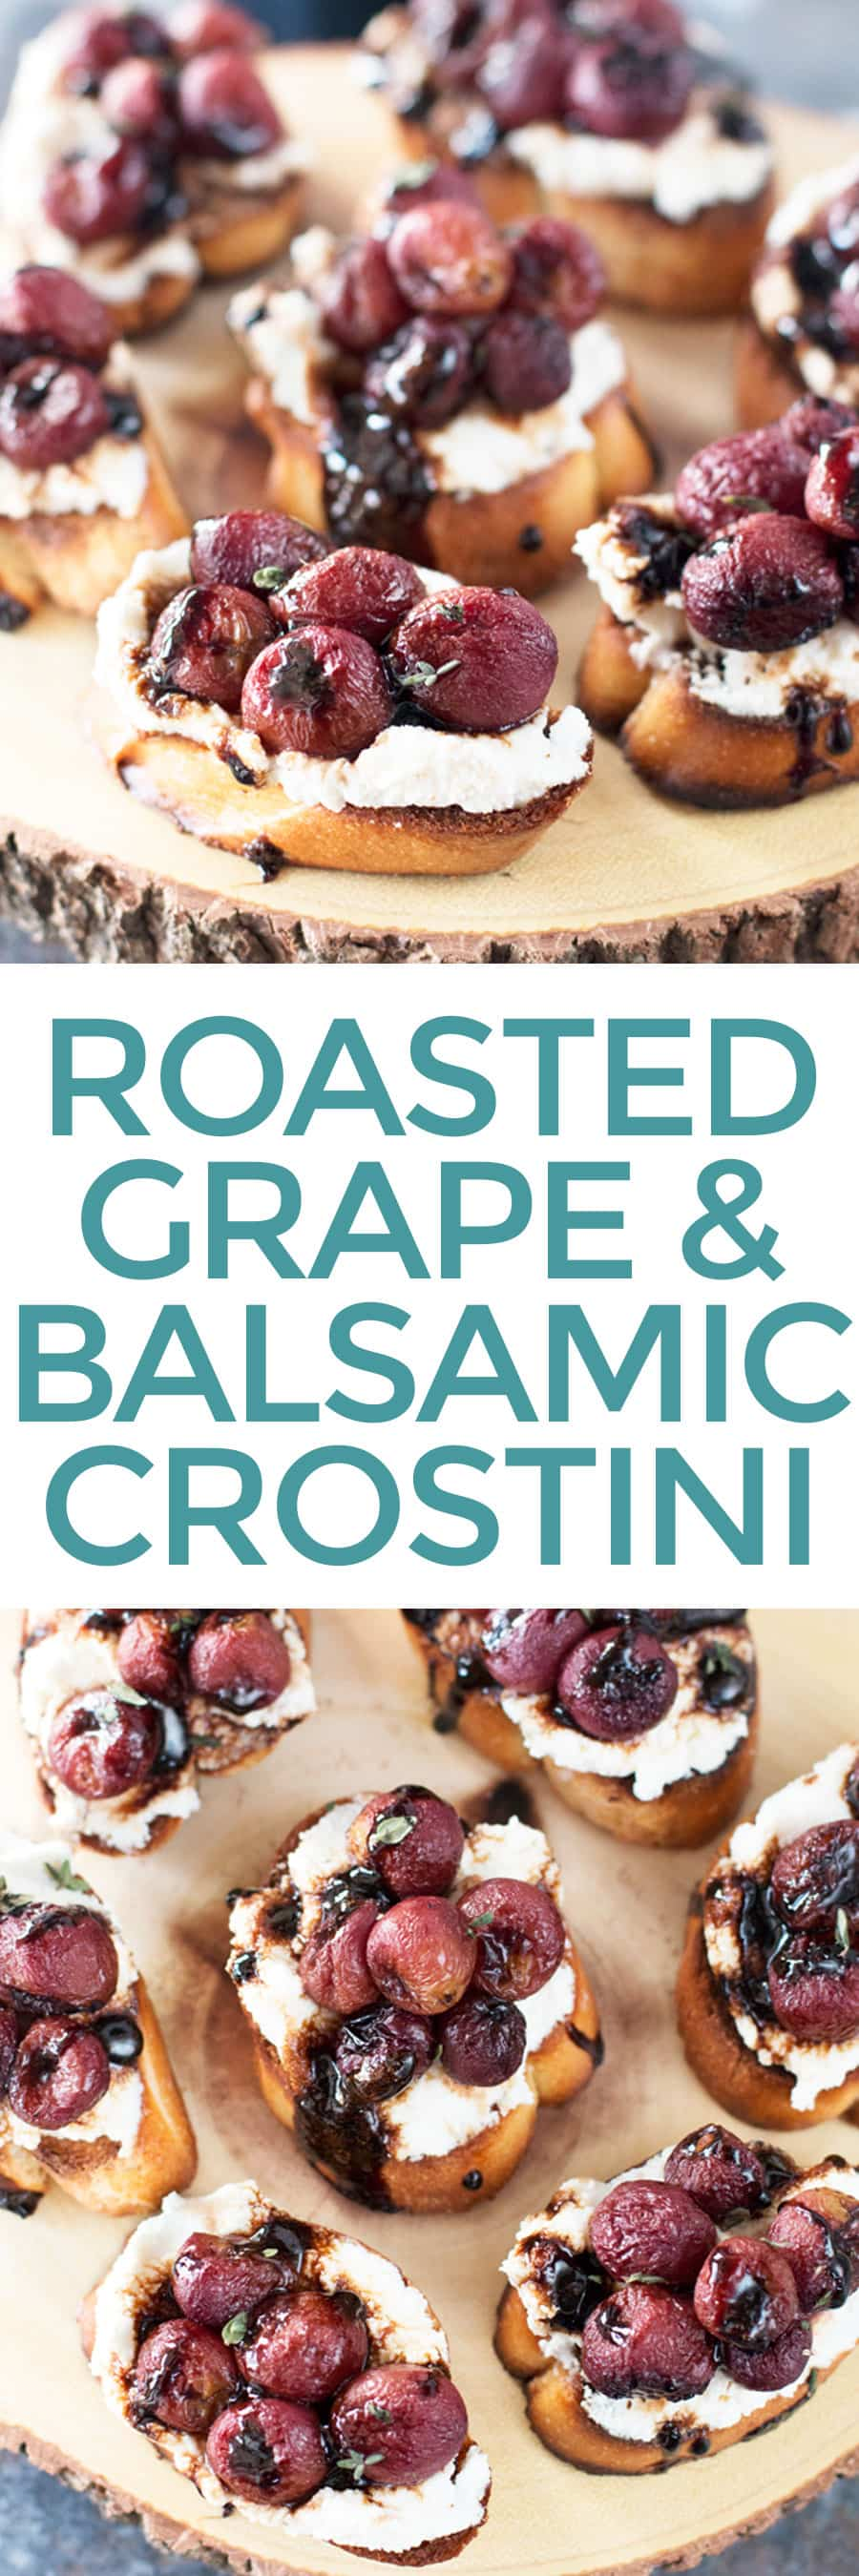 Roasted Grape and Balsamic Crostini | cakenknife.com